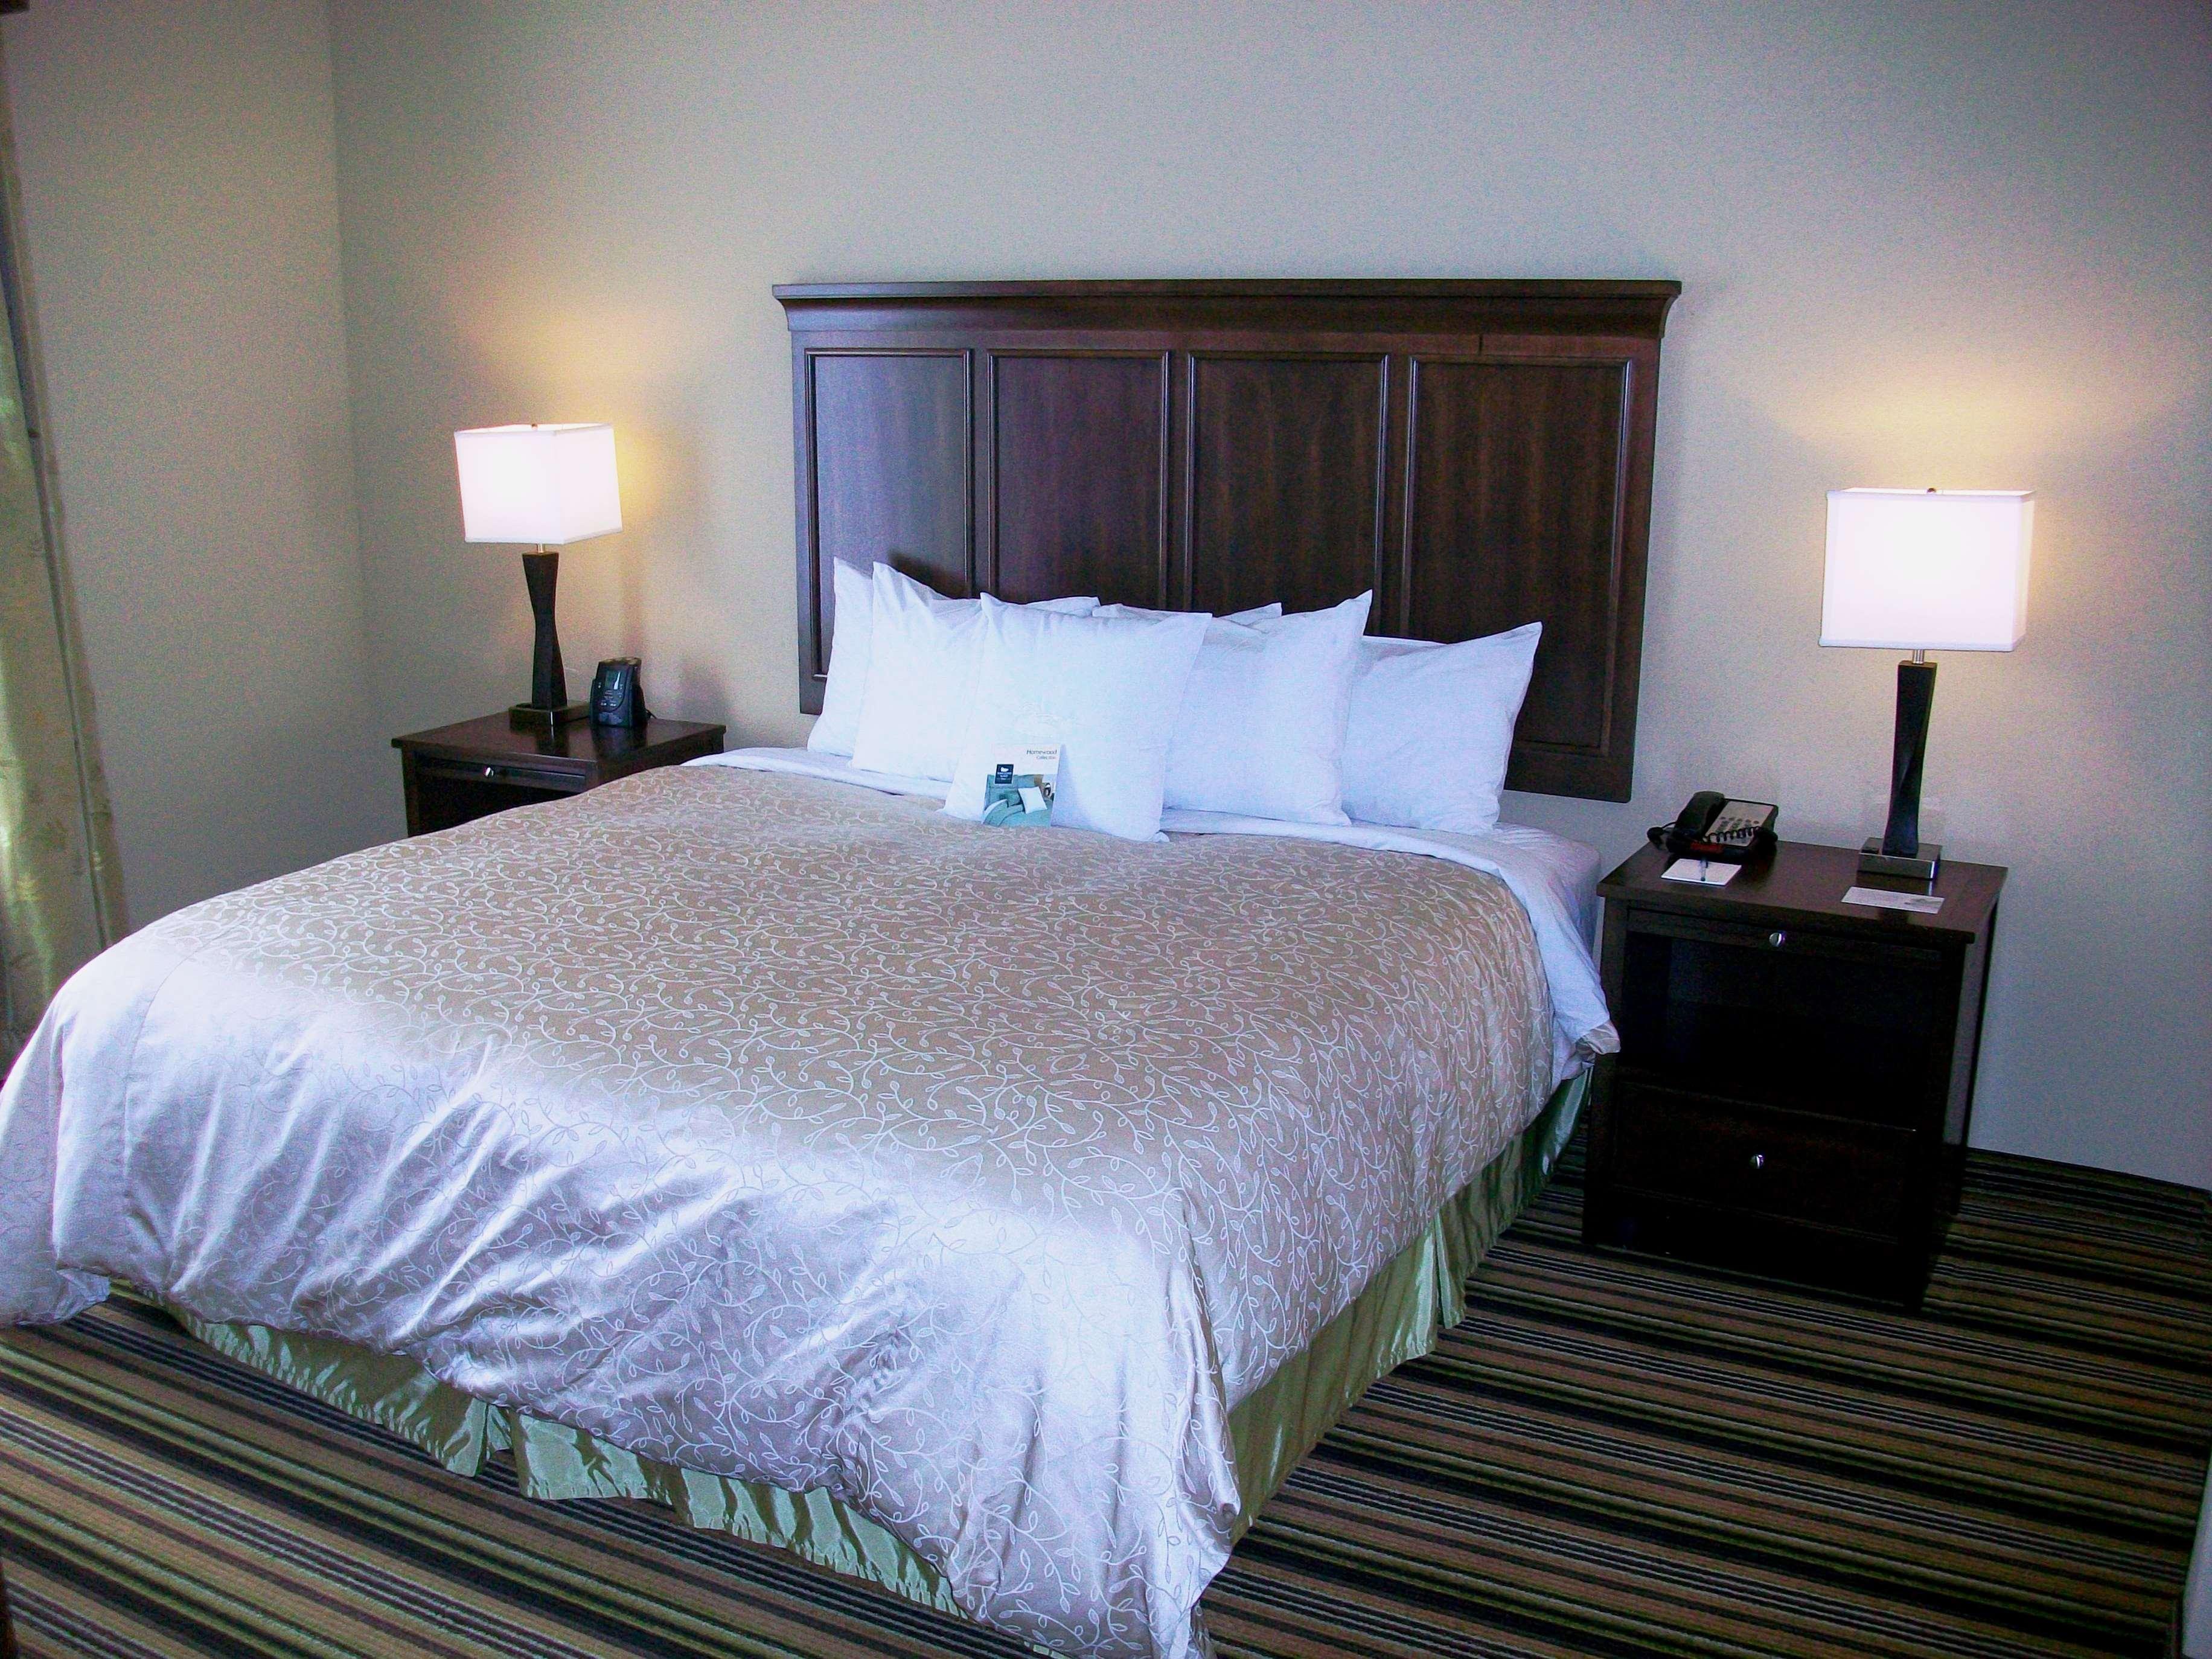 Homewood Suites by Hilton Charlotte/Ayrsley, NC image 10